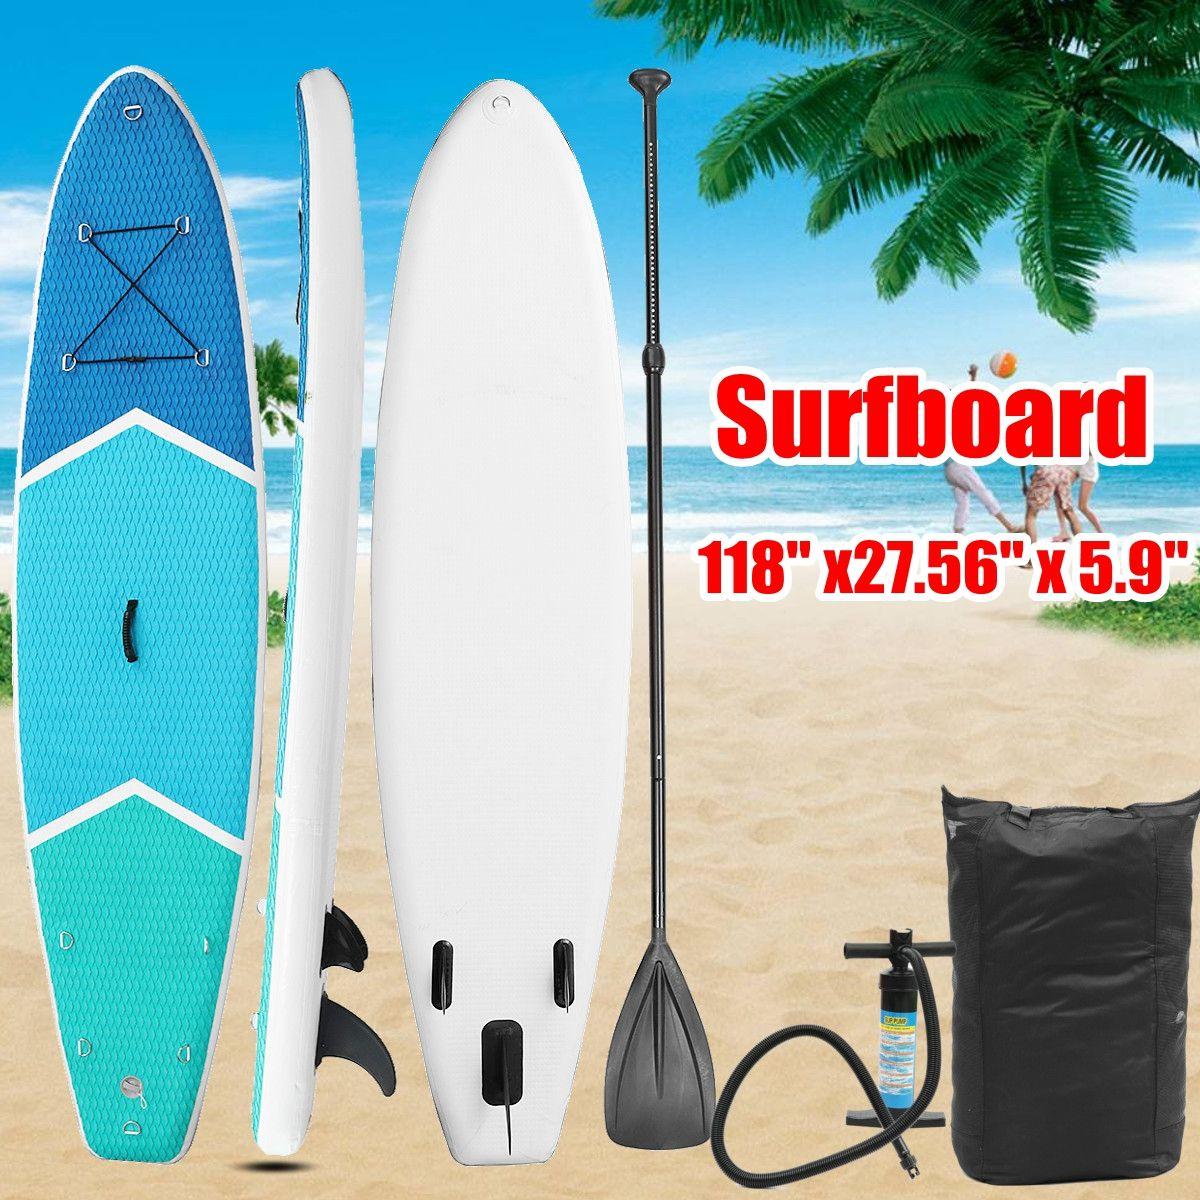 300*70*15 cm aufblasbare surfbrett Aufstehen SUP Bord Brett Surf aufblasbar tretboot mit reparaturmaterial + Paddel